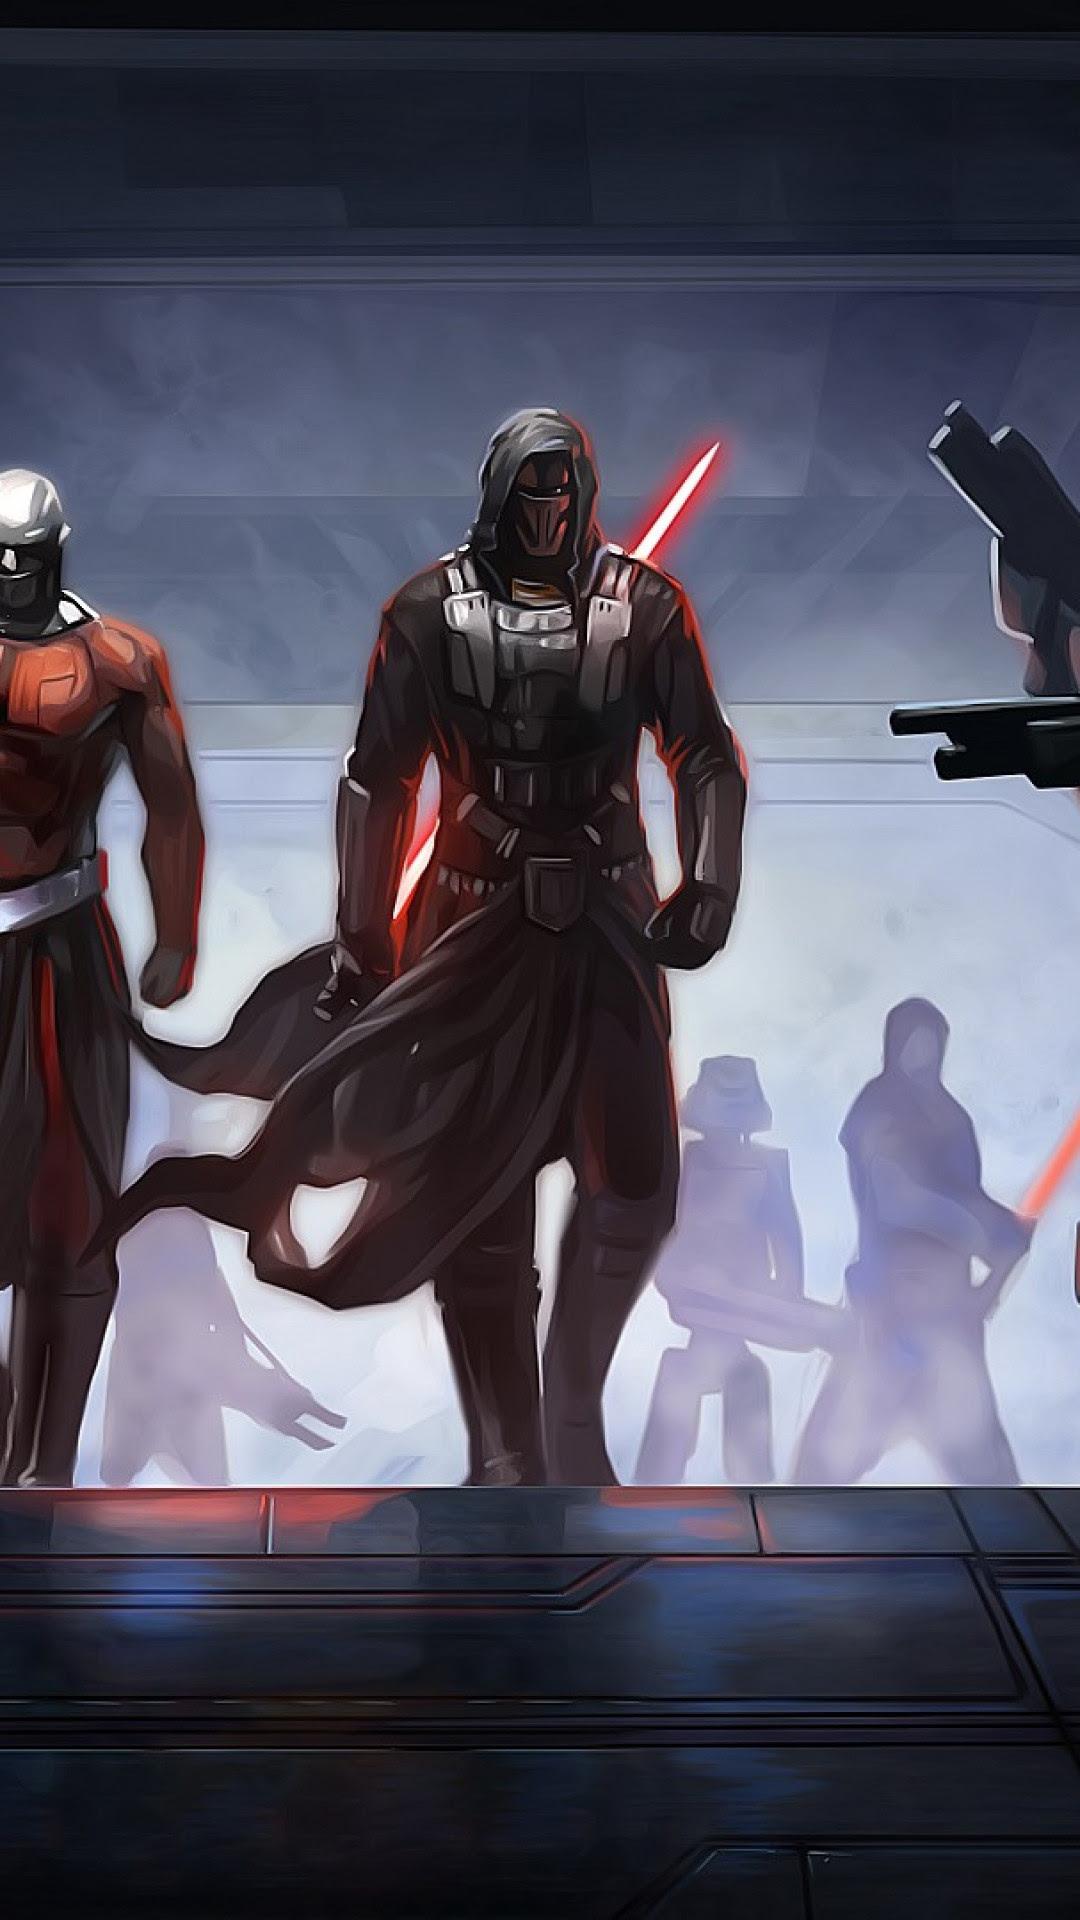 Star Wars Kotor Wallpaper 62 Images